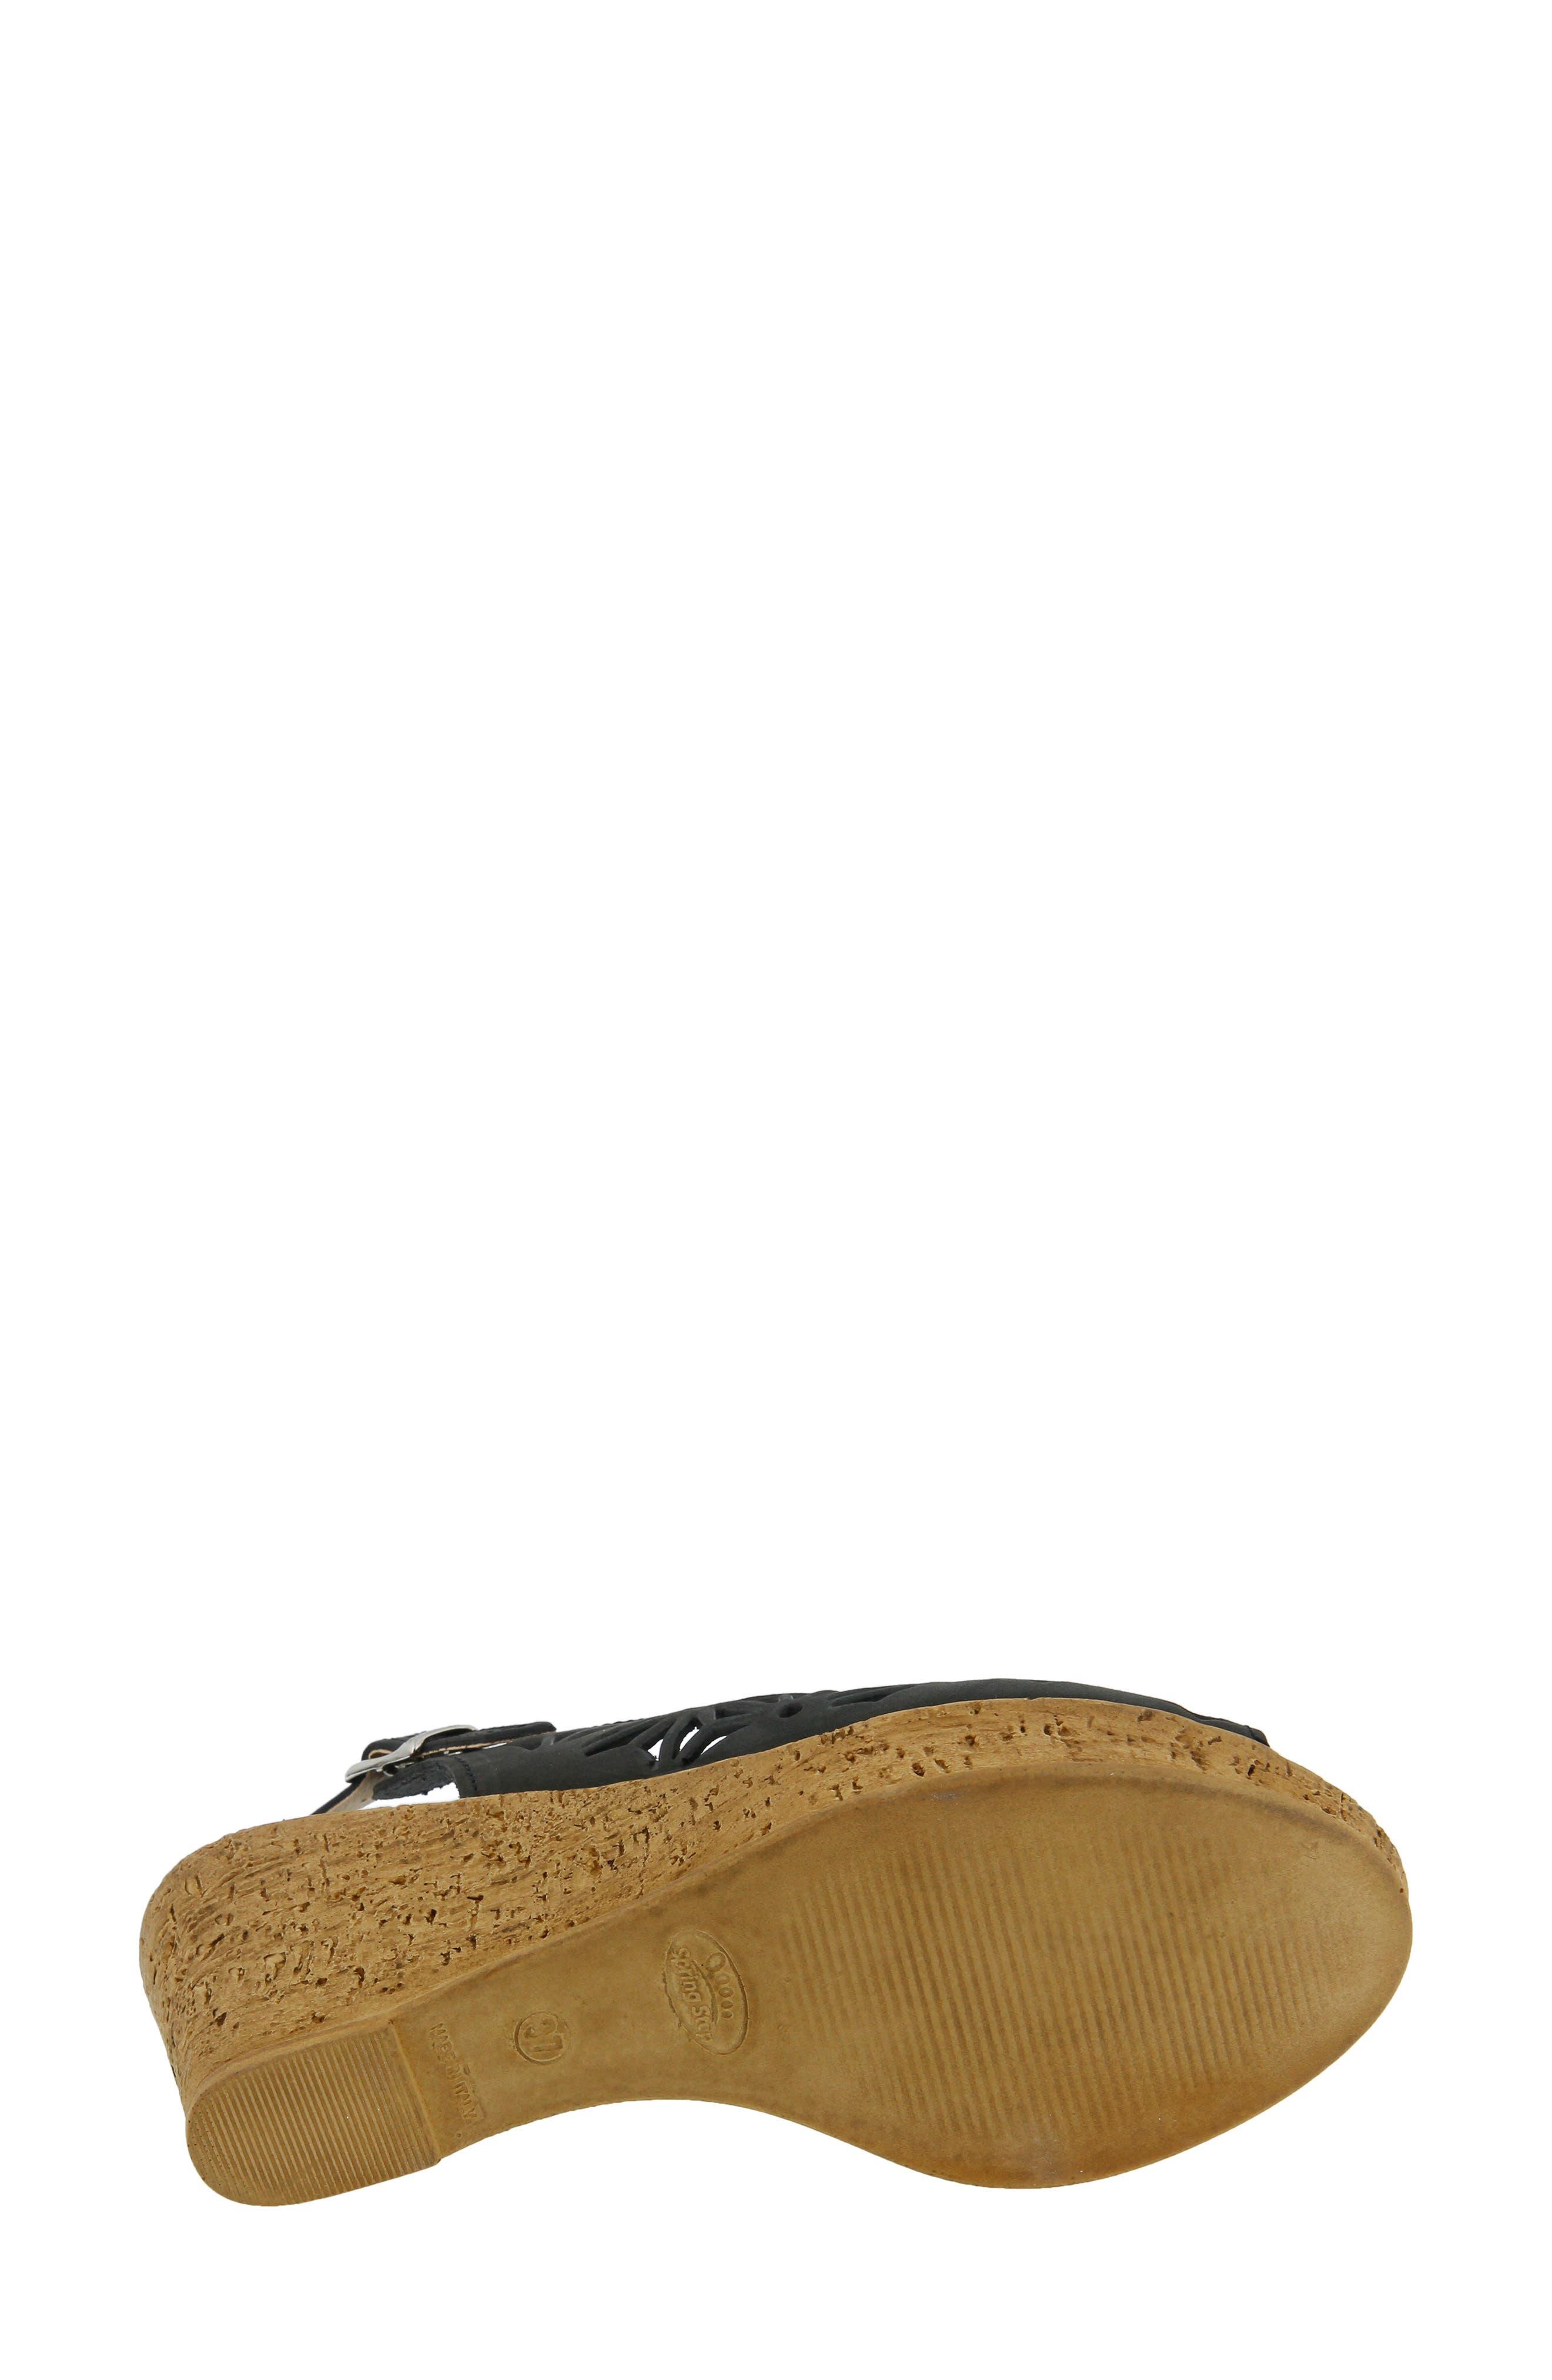 SPRING STEP,                             Abigail Platform Wedge Sandal,                             Alternate thumbnail 4, color,                             BLACK LEATHER